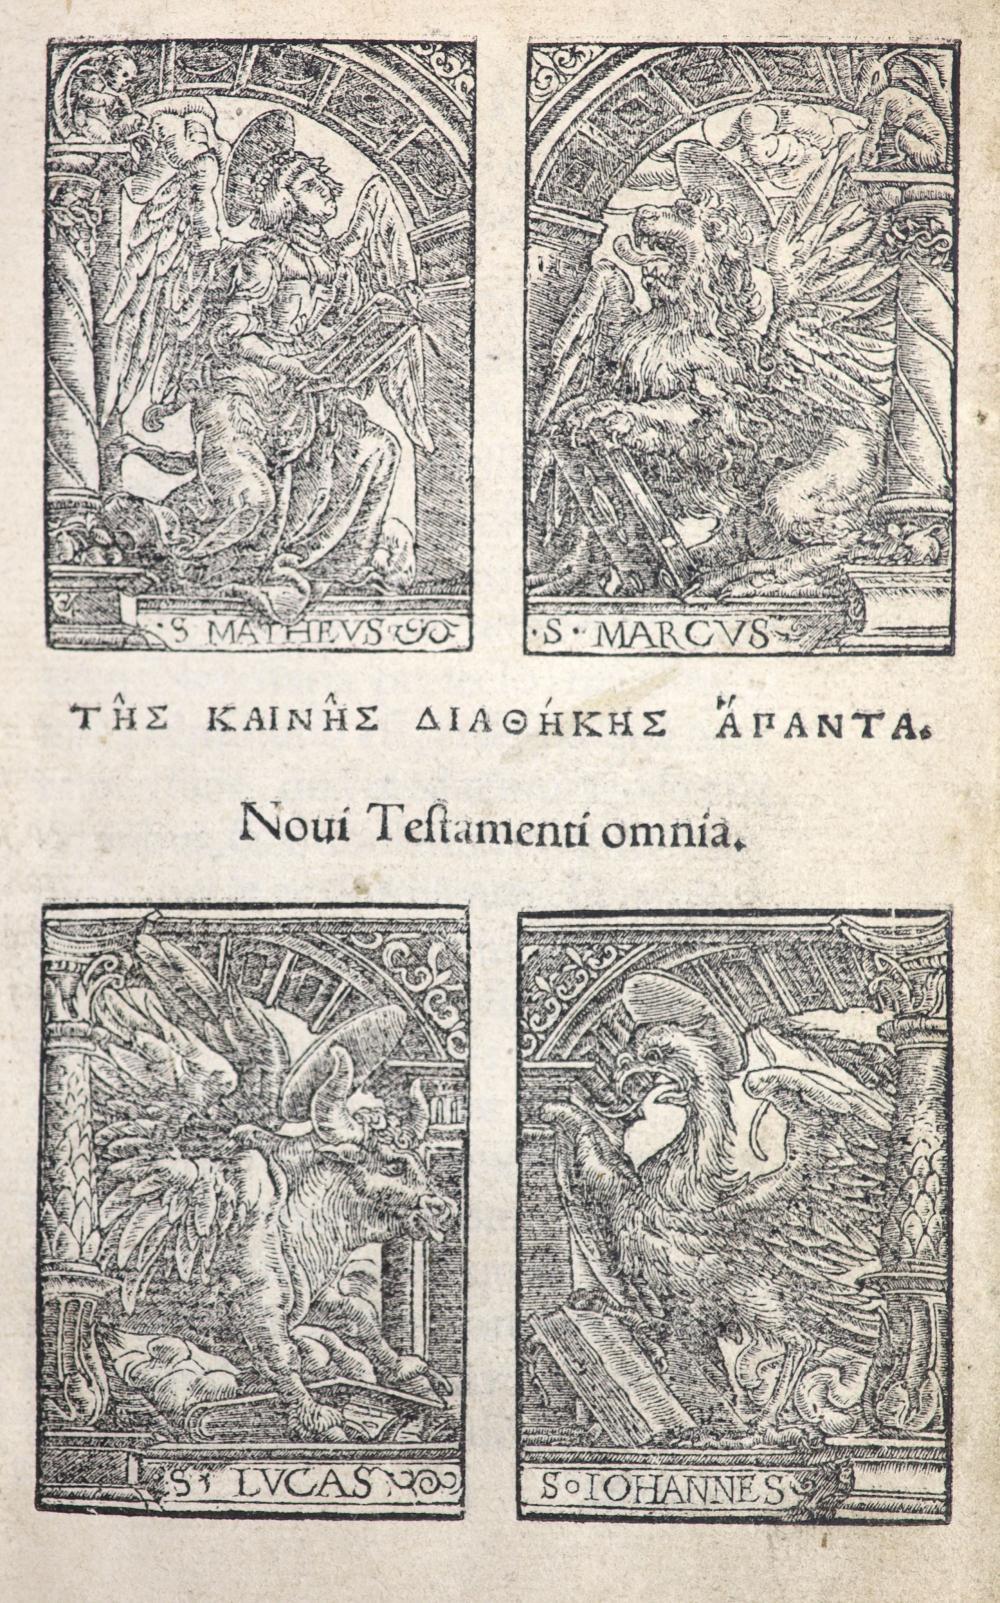 Bible, New Testament in Greek - Tes Kaines diathekes hapanta. Nov Testamenti Ominia, 1st edition,